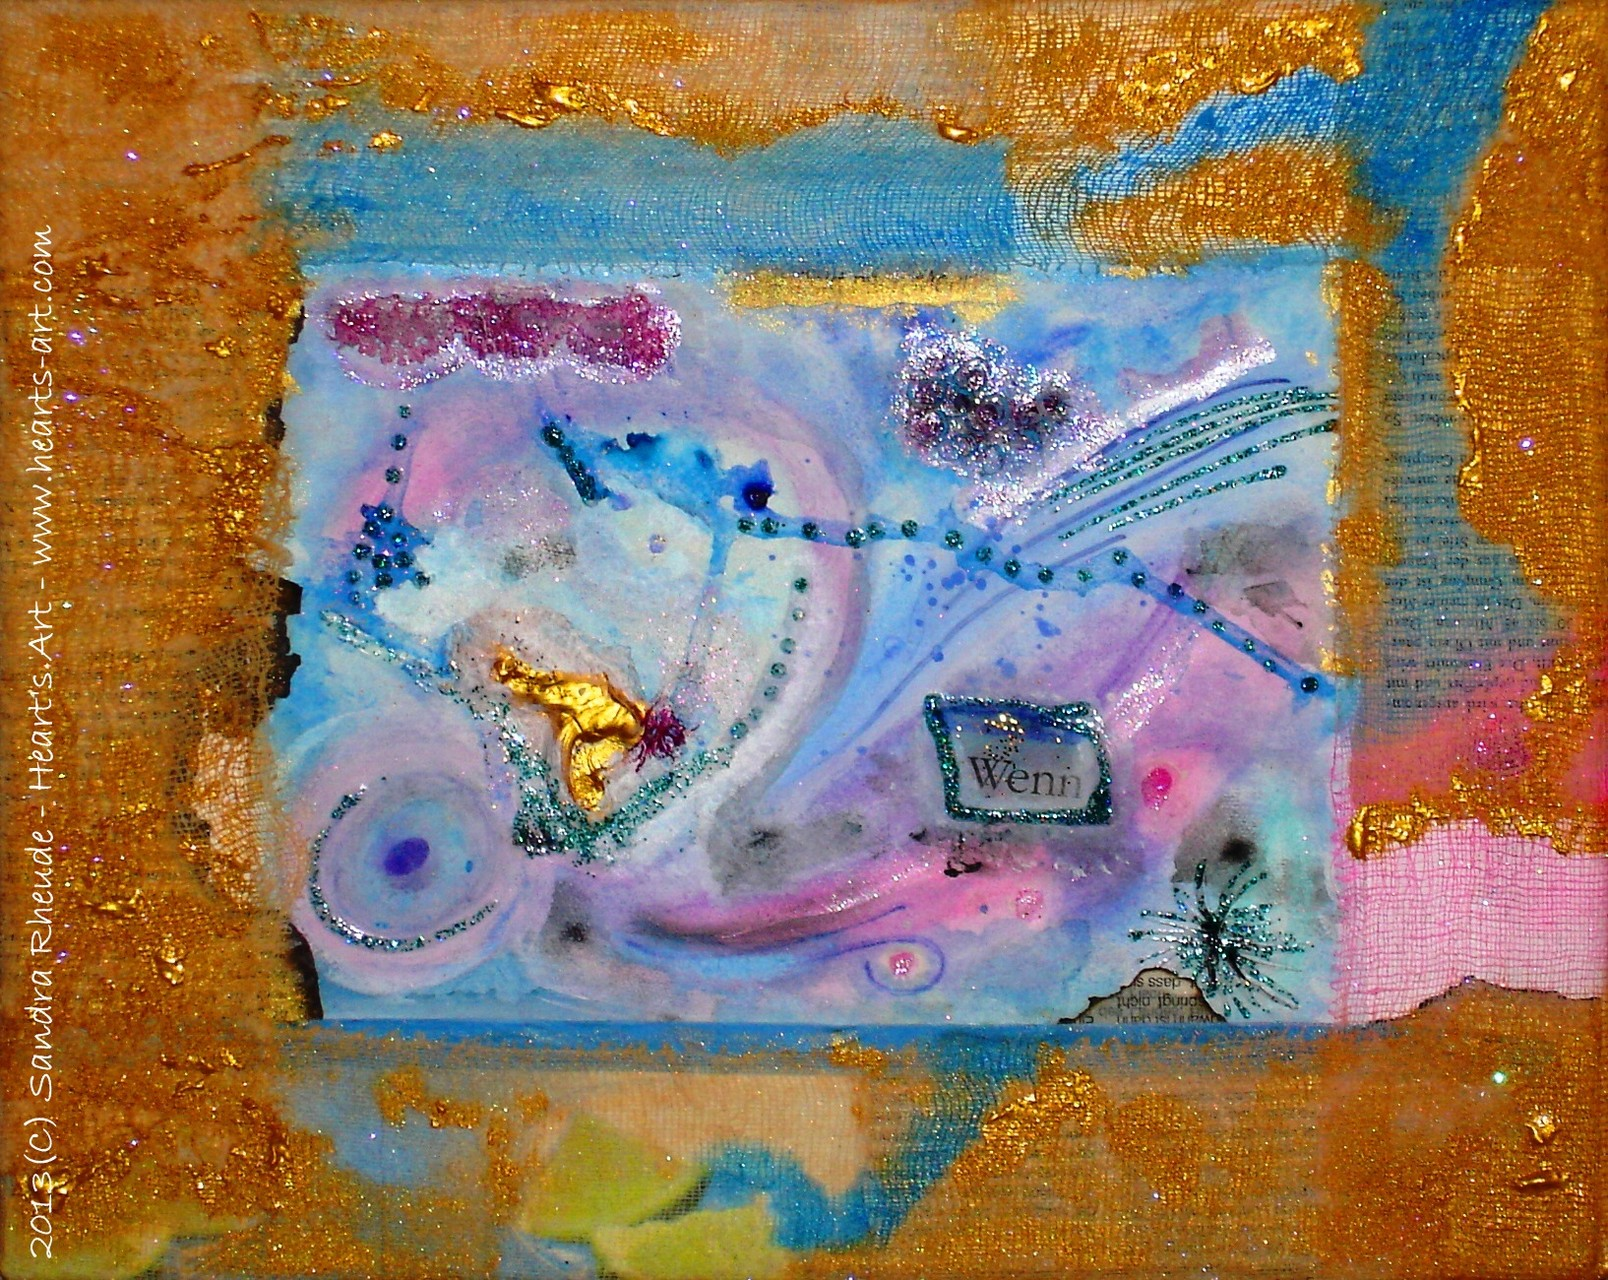 'Wenn' - 2013/76 - Acryl/MixedMedia auf Leinwand - 30 x 24 cm - € 130